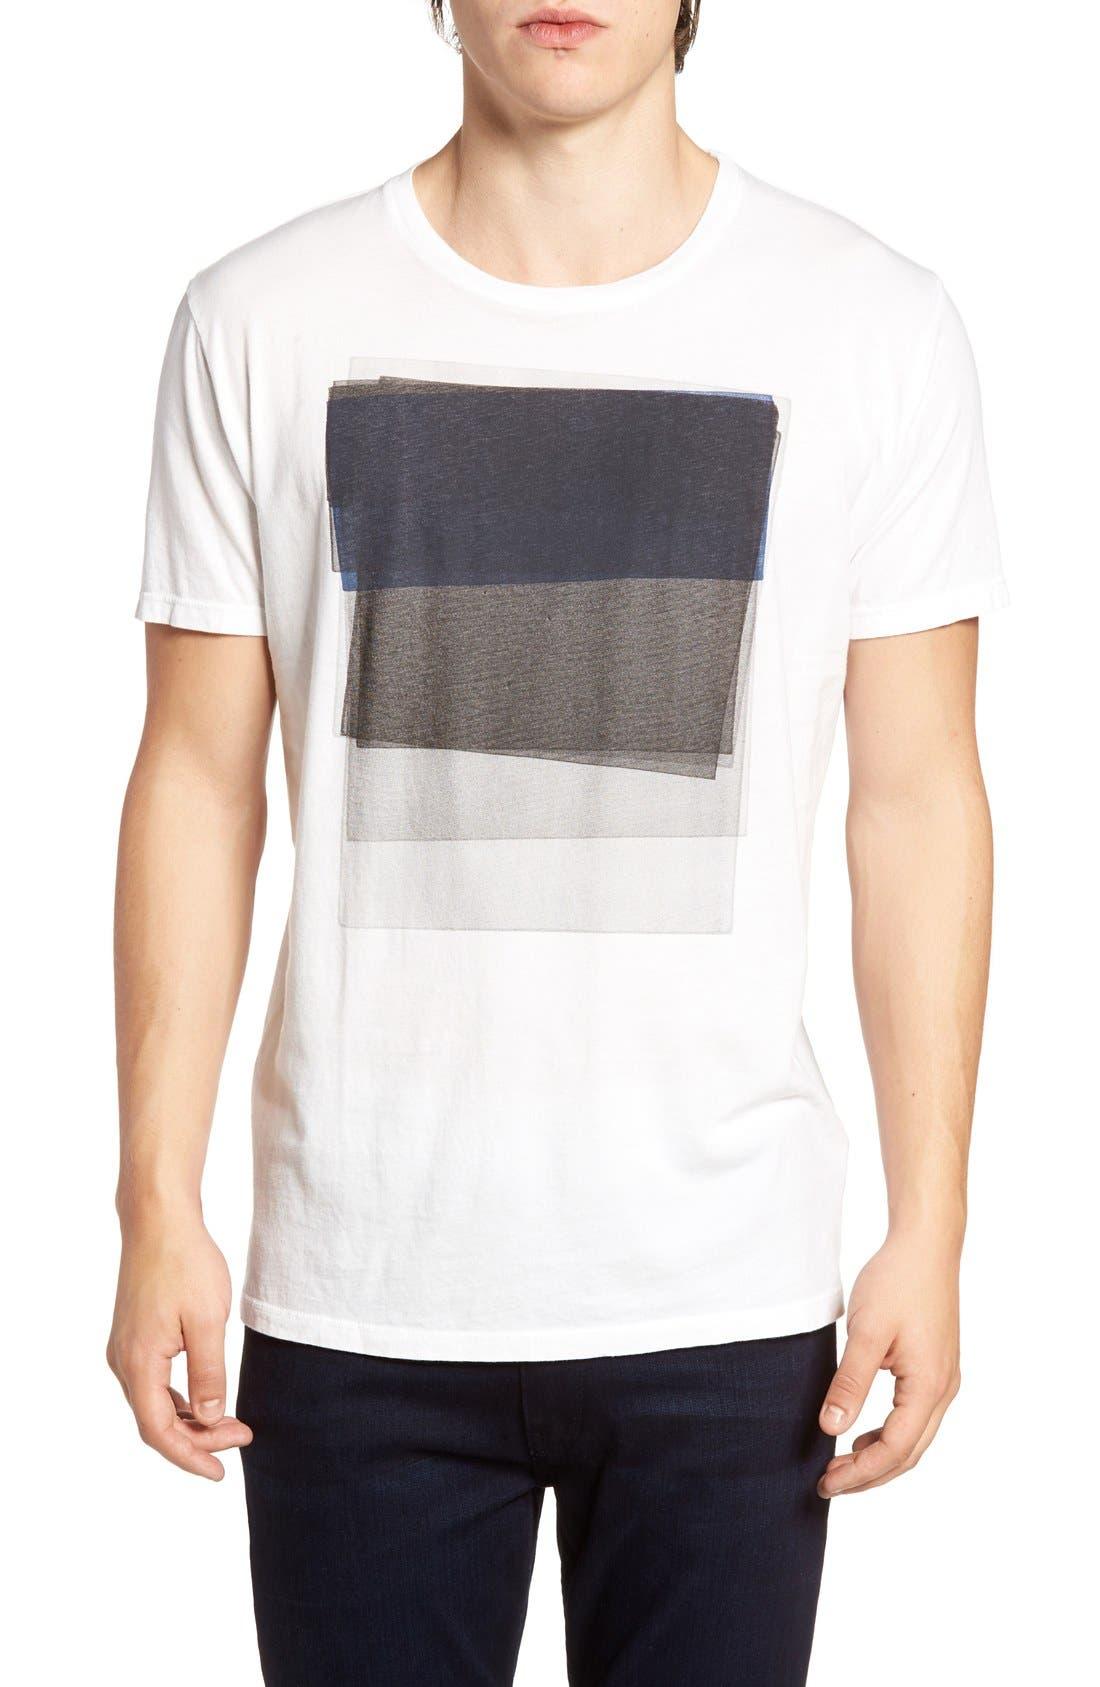 Main Image - Vestige Sunken Graphic T-Shirt